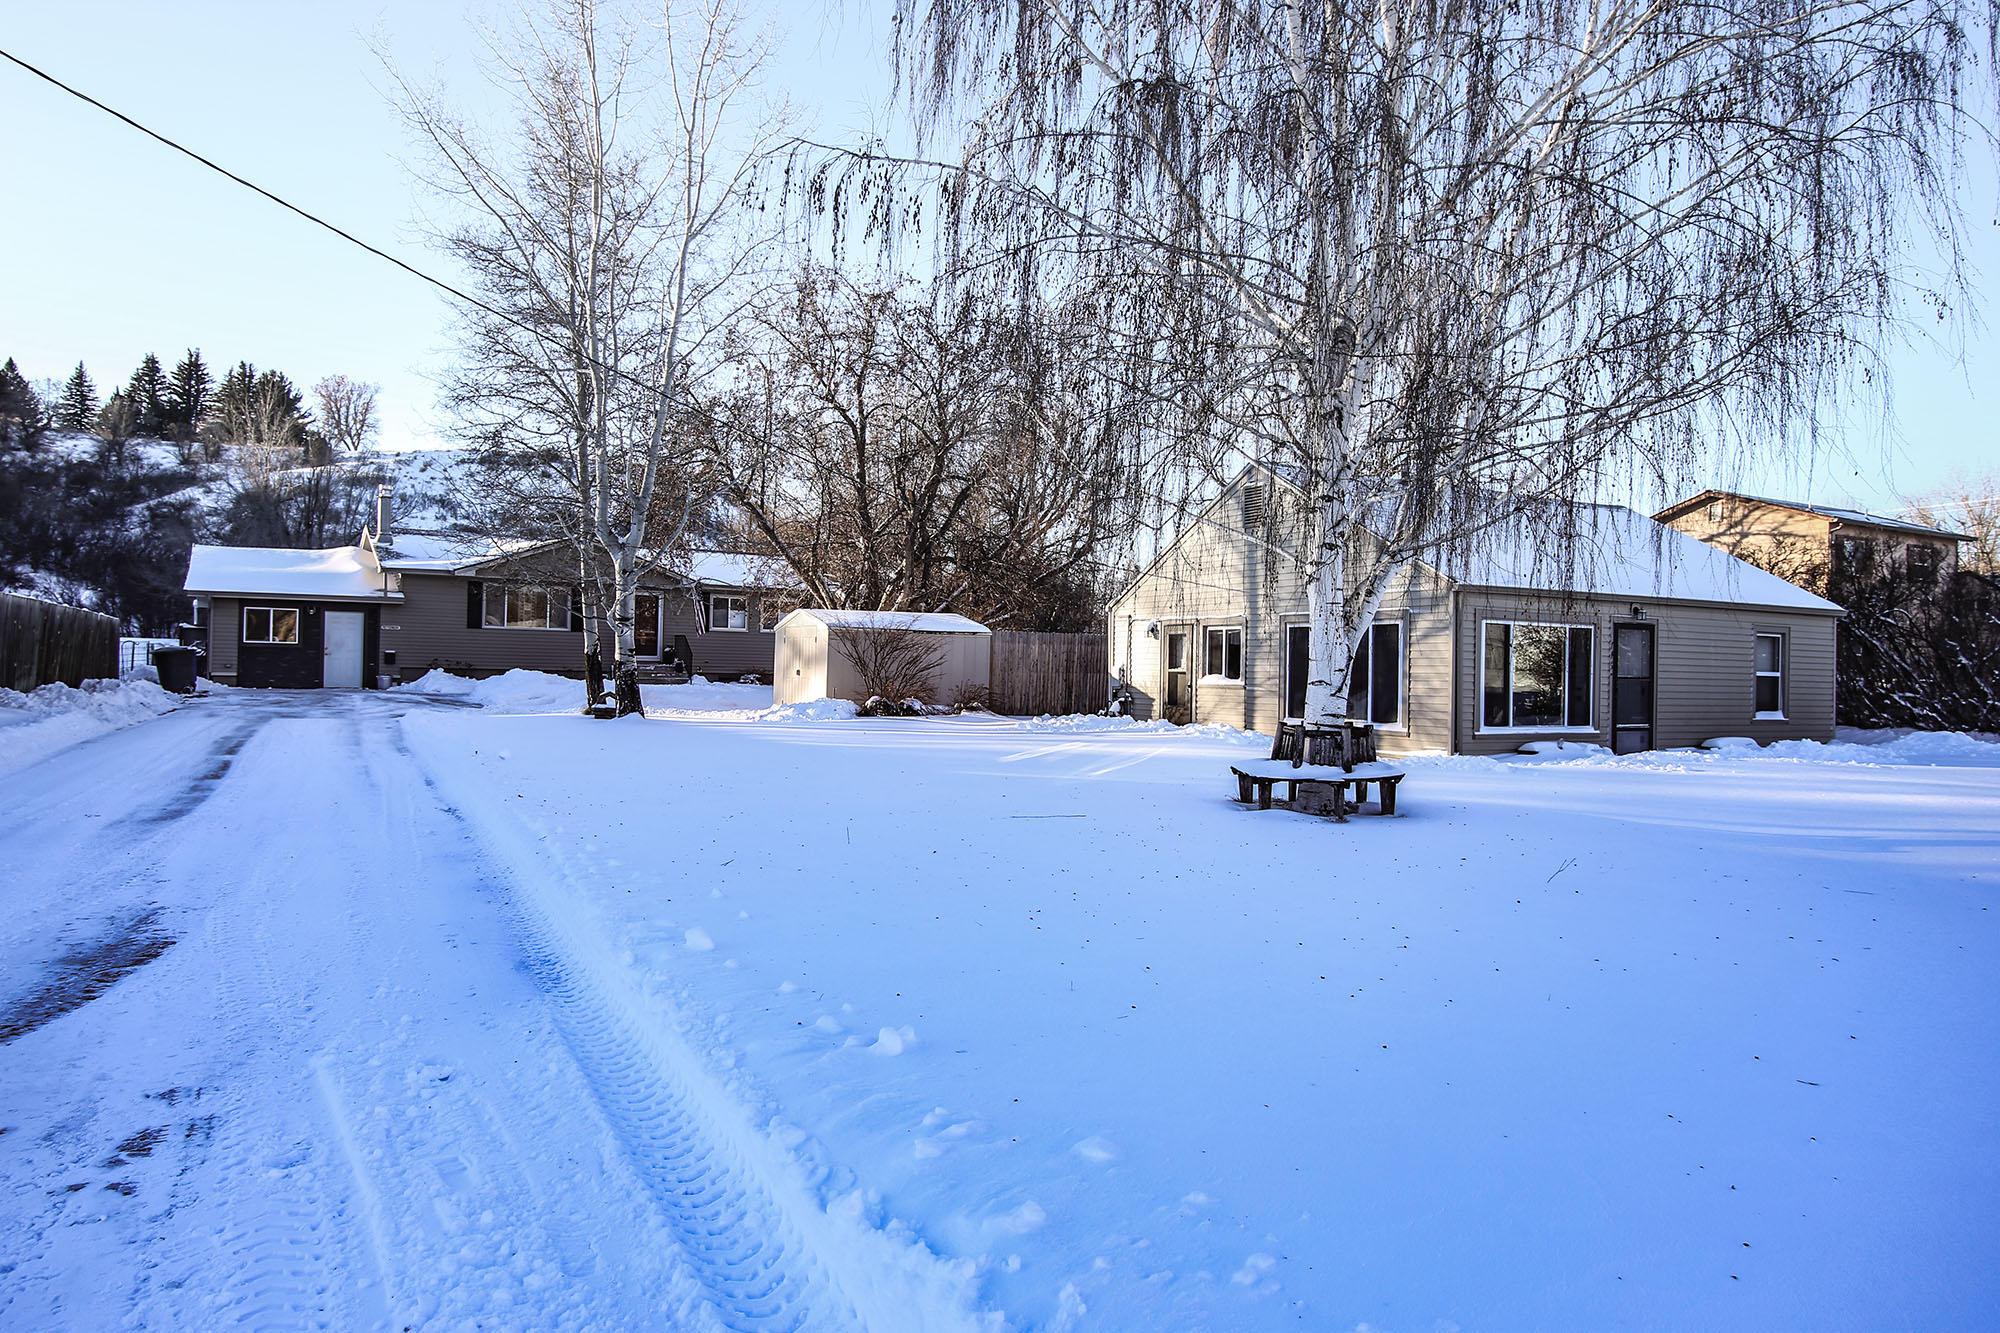 742/746 Harrison Street, Sheridan, Wyoming 82801, 4 Bedrooms Bedrooms, ,2 BathroomsBathrooms,Residential,For Sale,Harrison,19-91